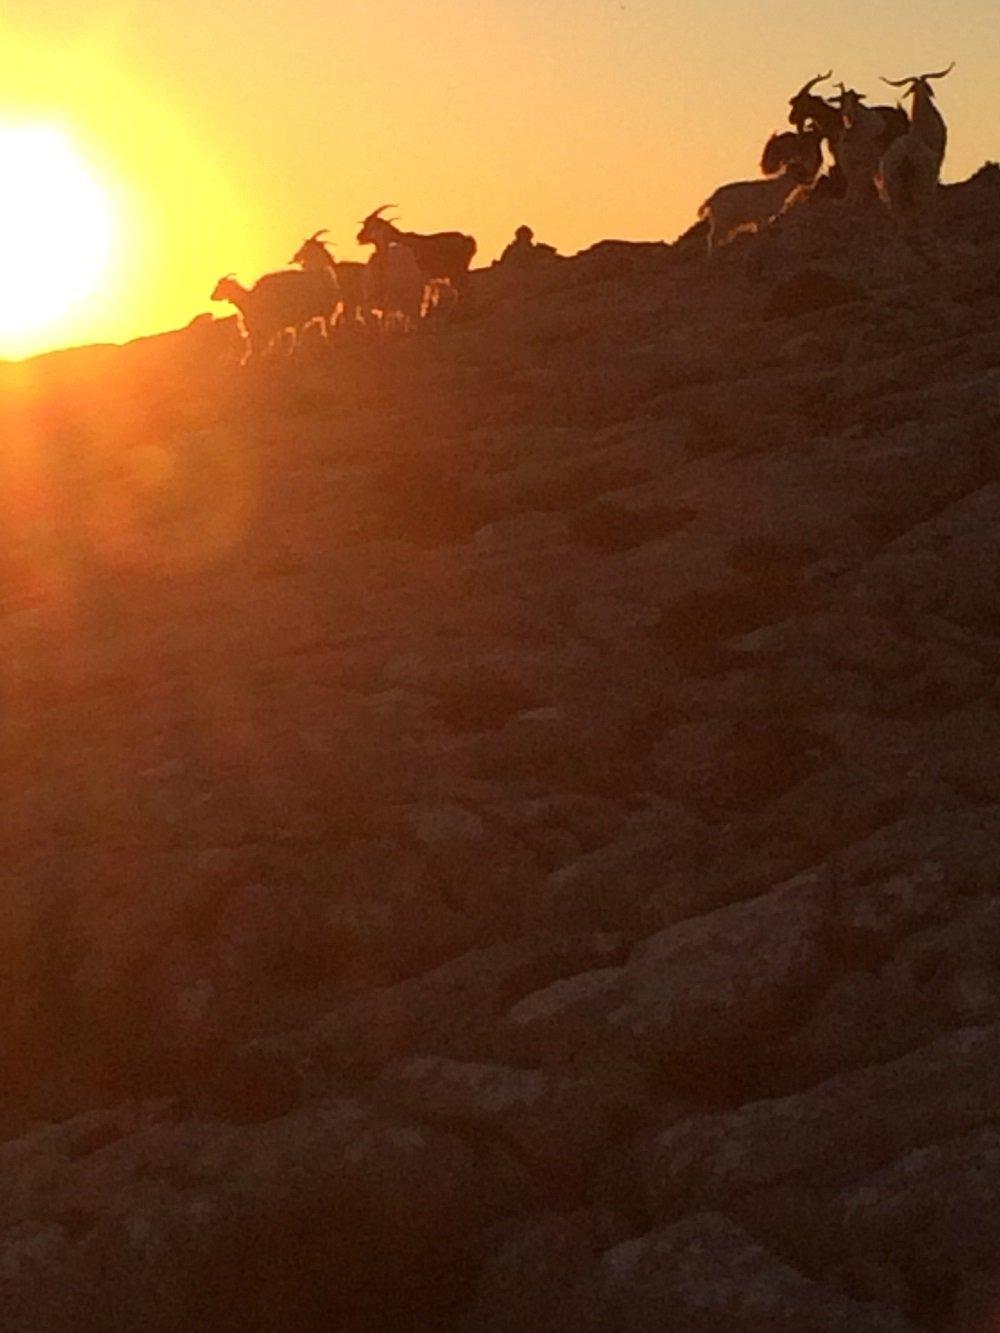 Splendido tramonto in totale solitudine, sulle creste del Supramonte